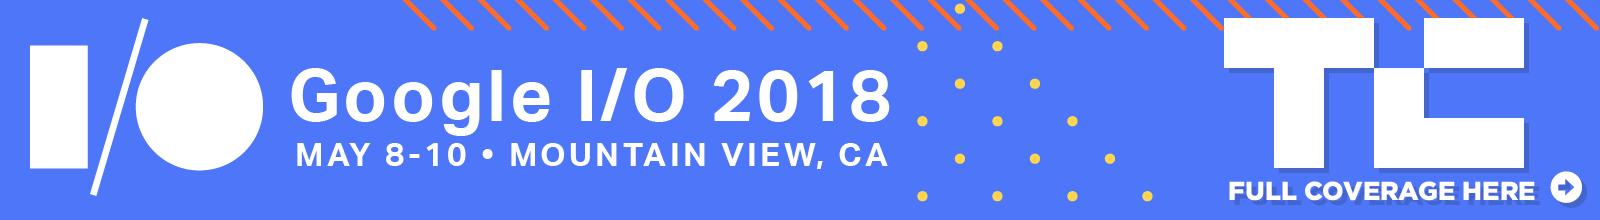 google io 2018 banner 1